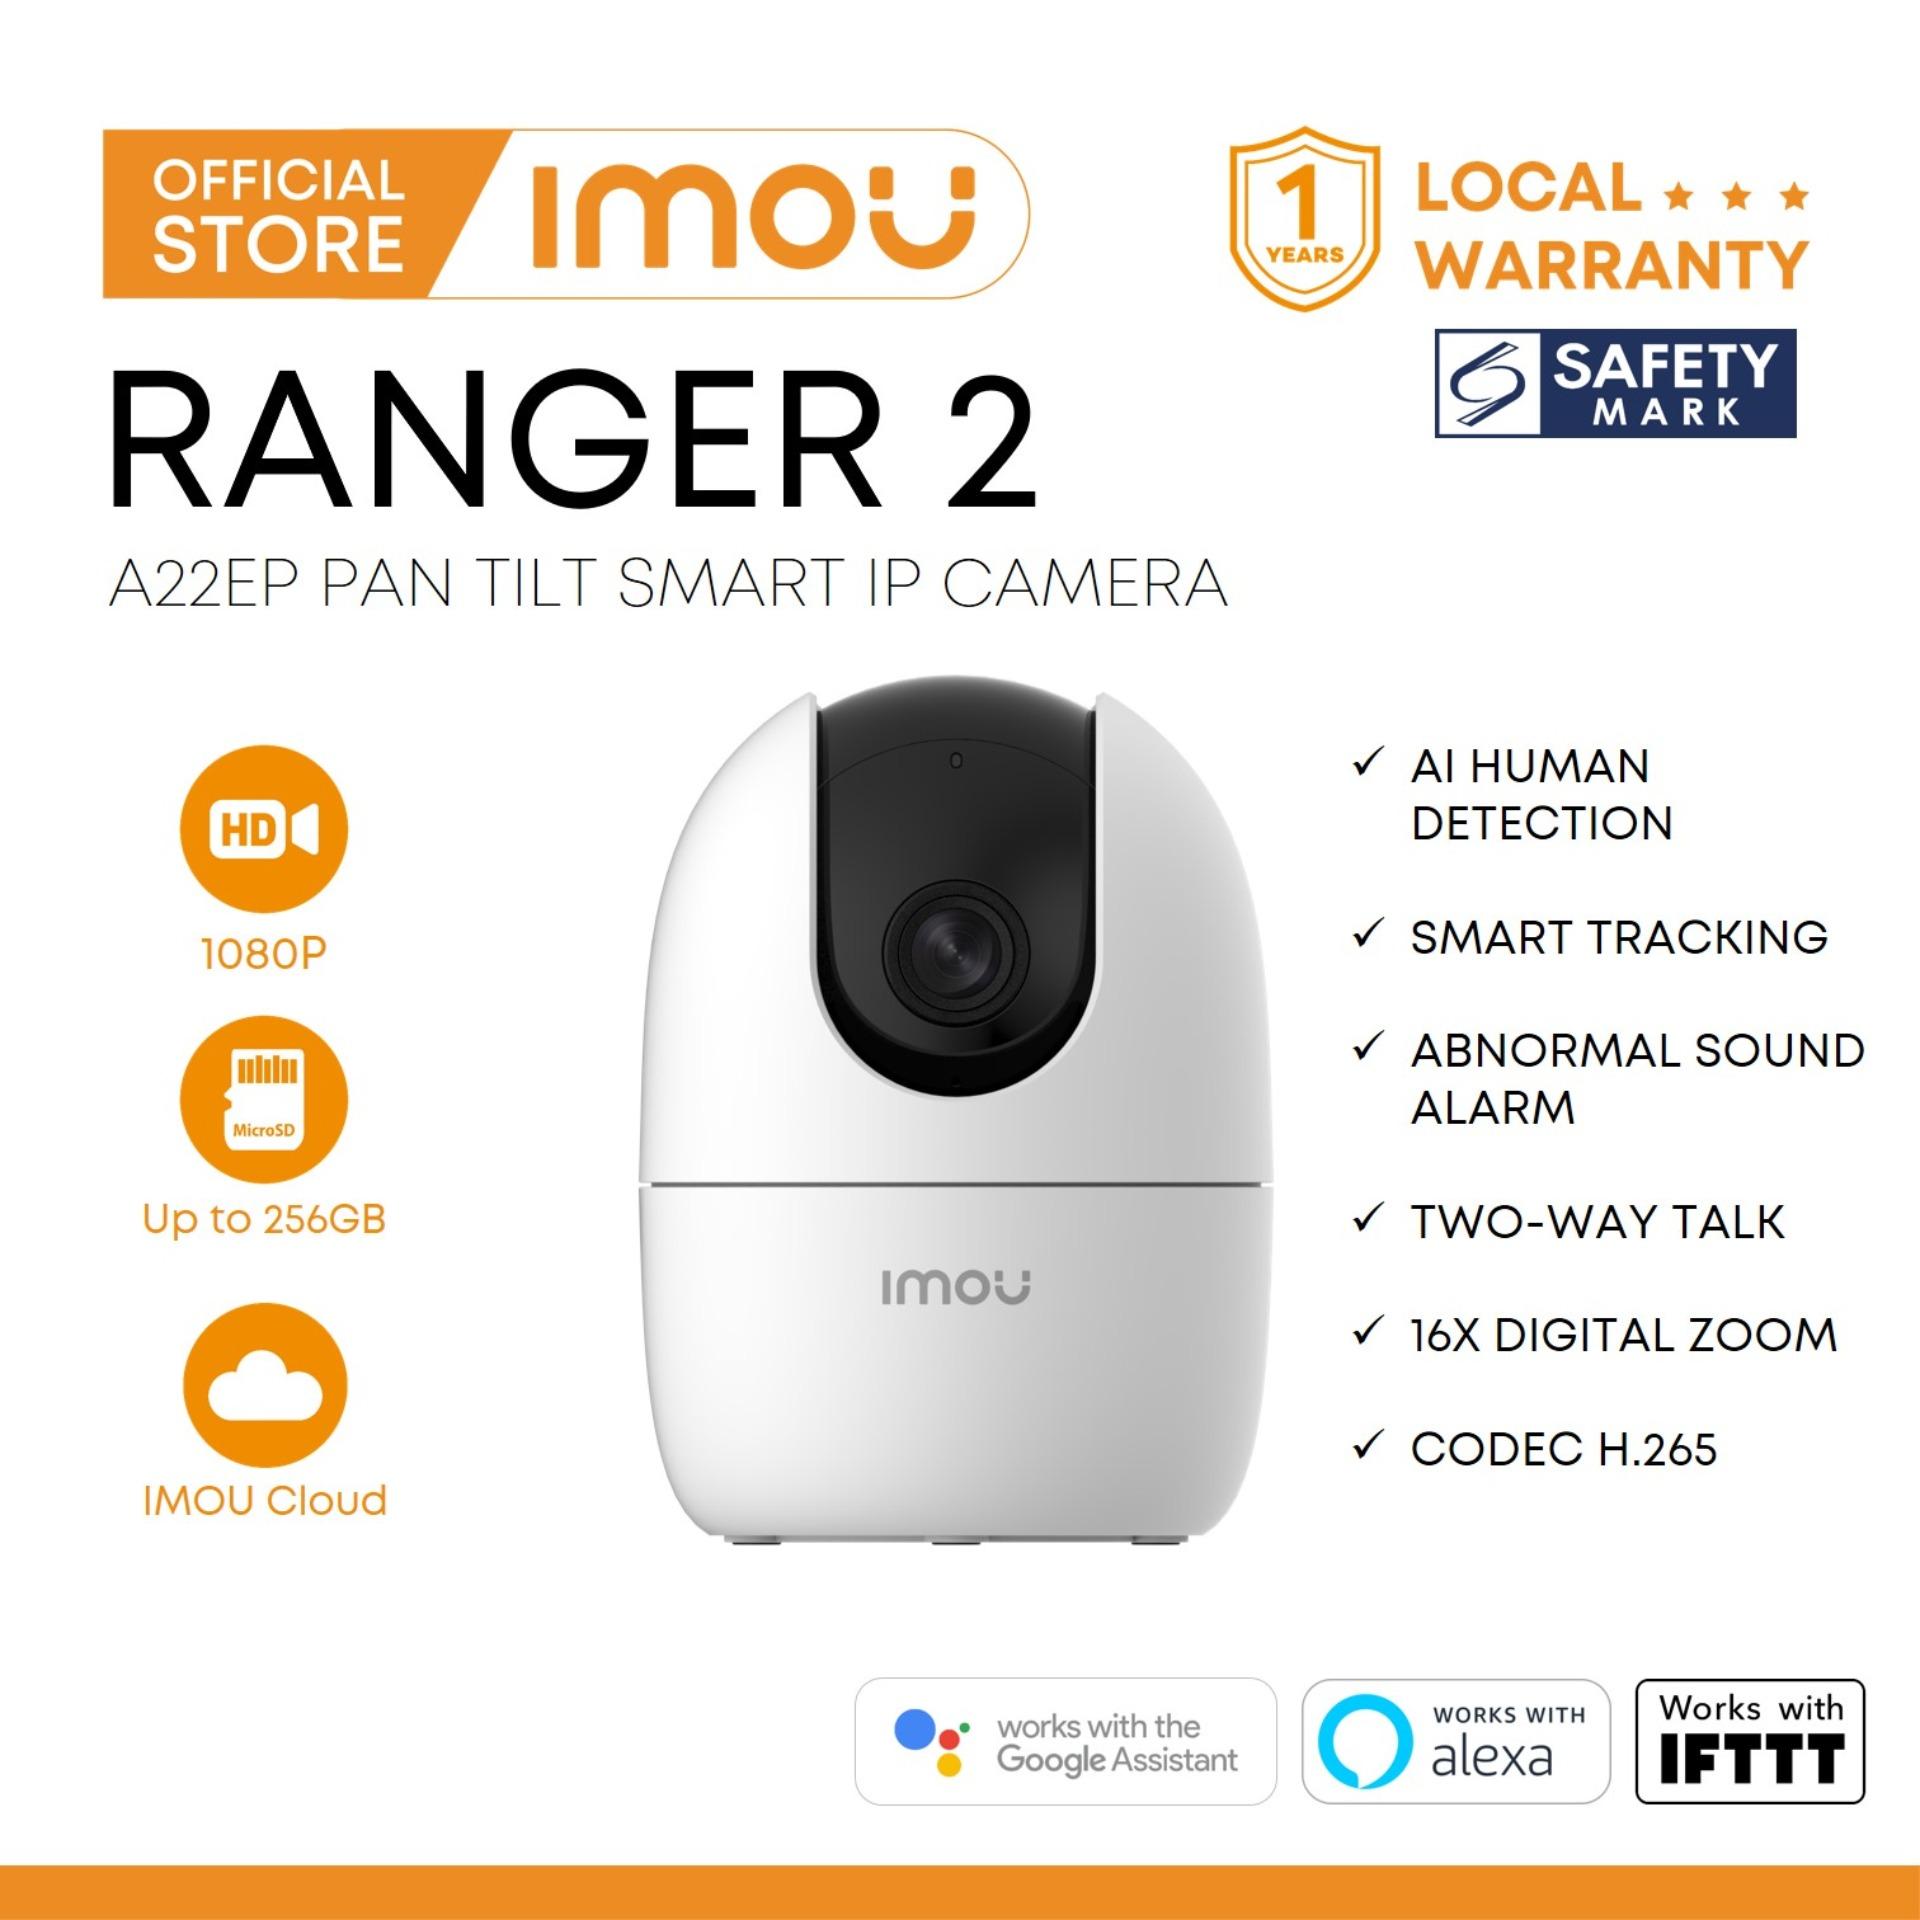 Imou Ranger 2 1080p A22ep 360 Degree Pan Tilt Smart Ip Camera.